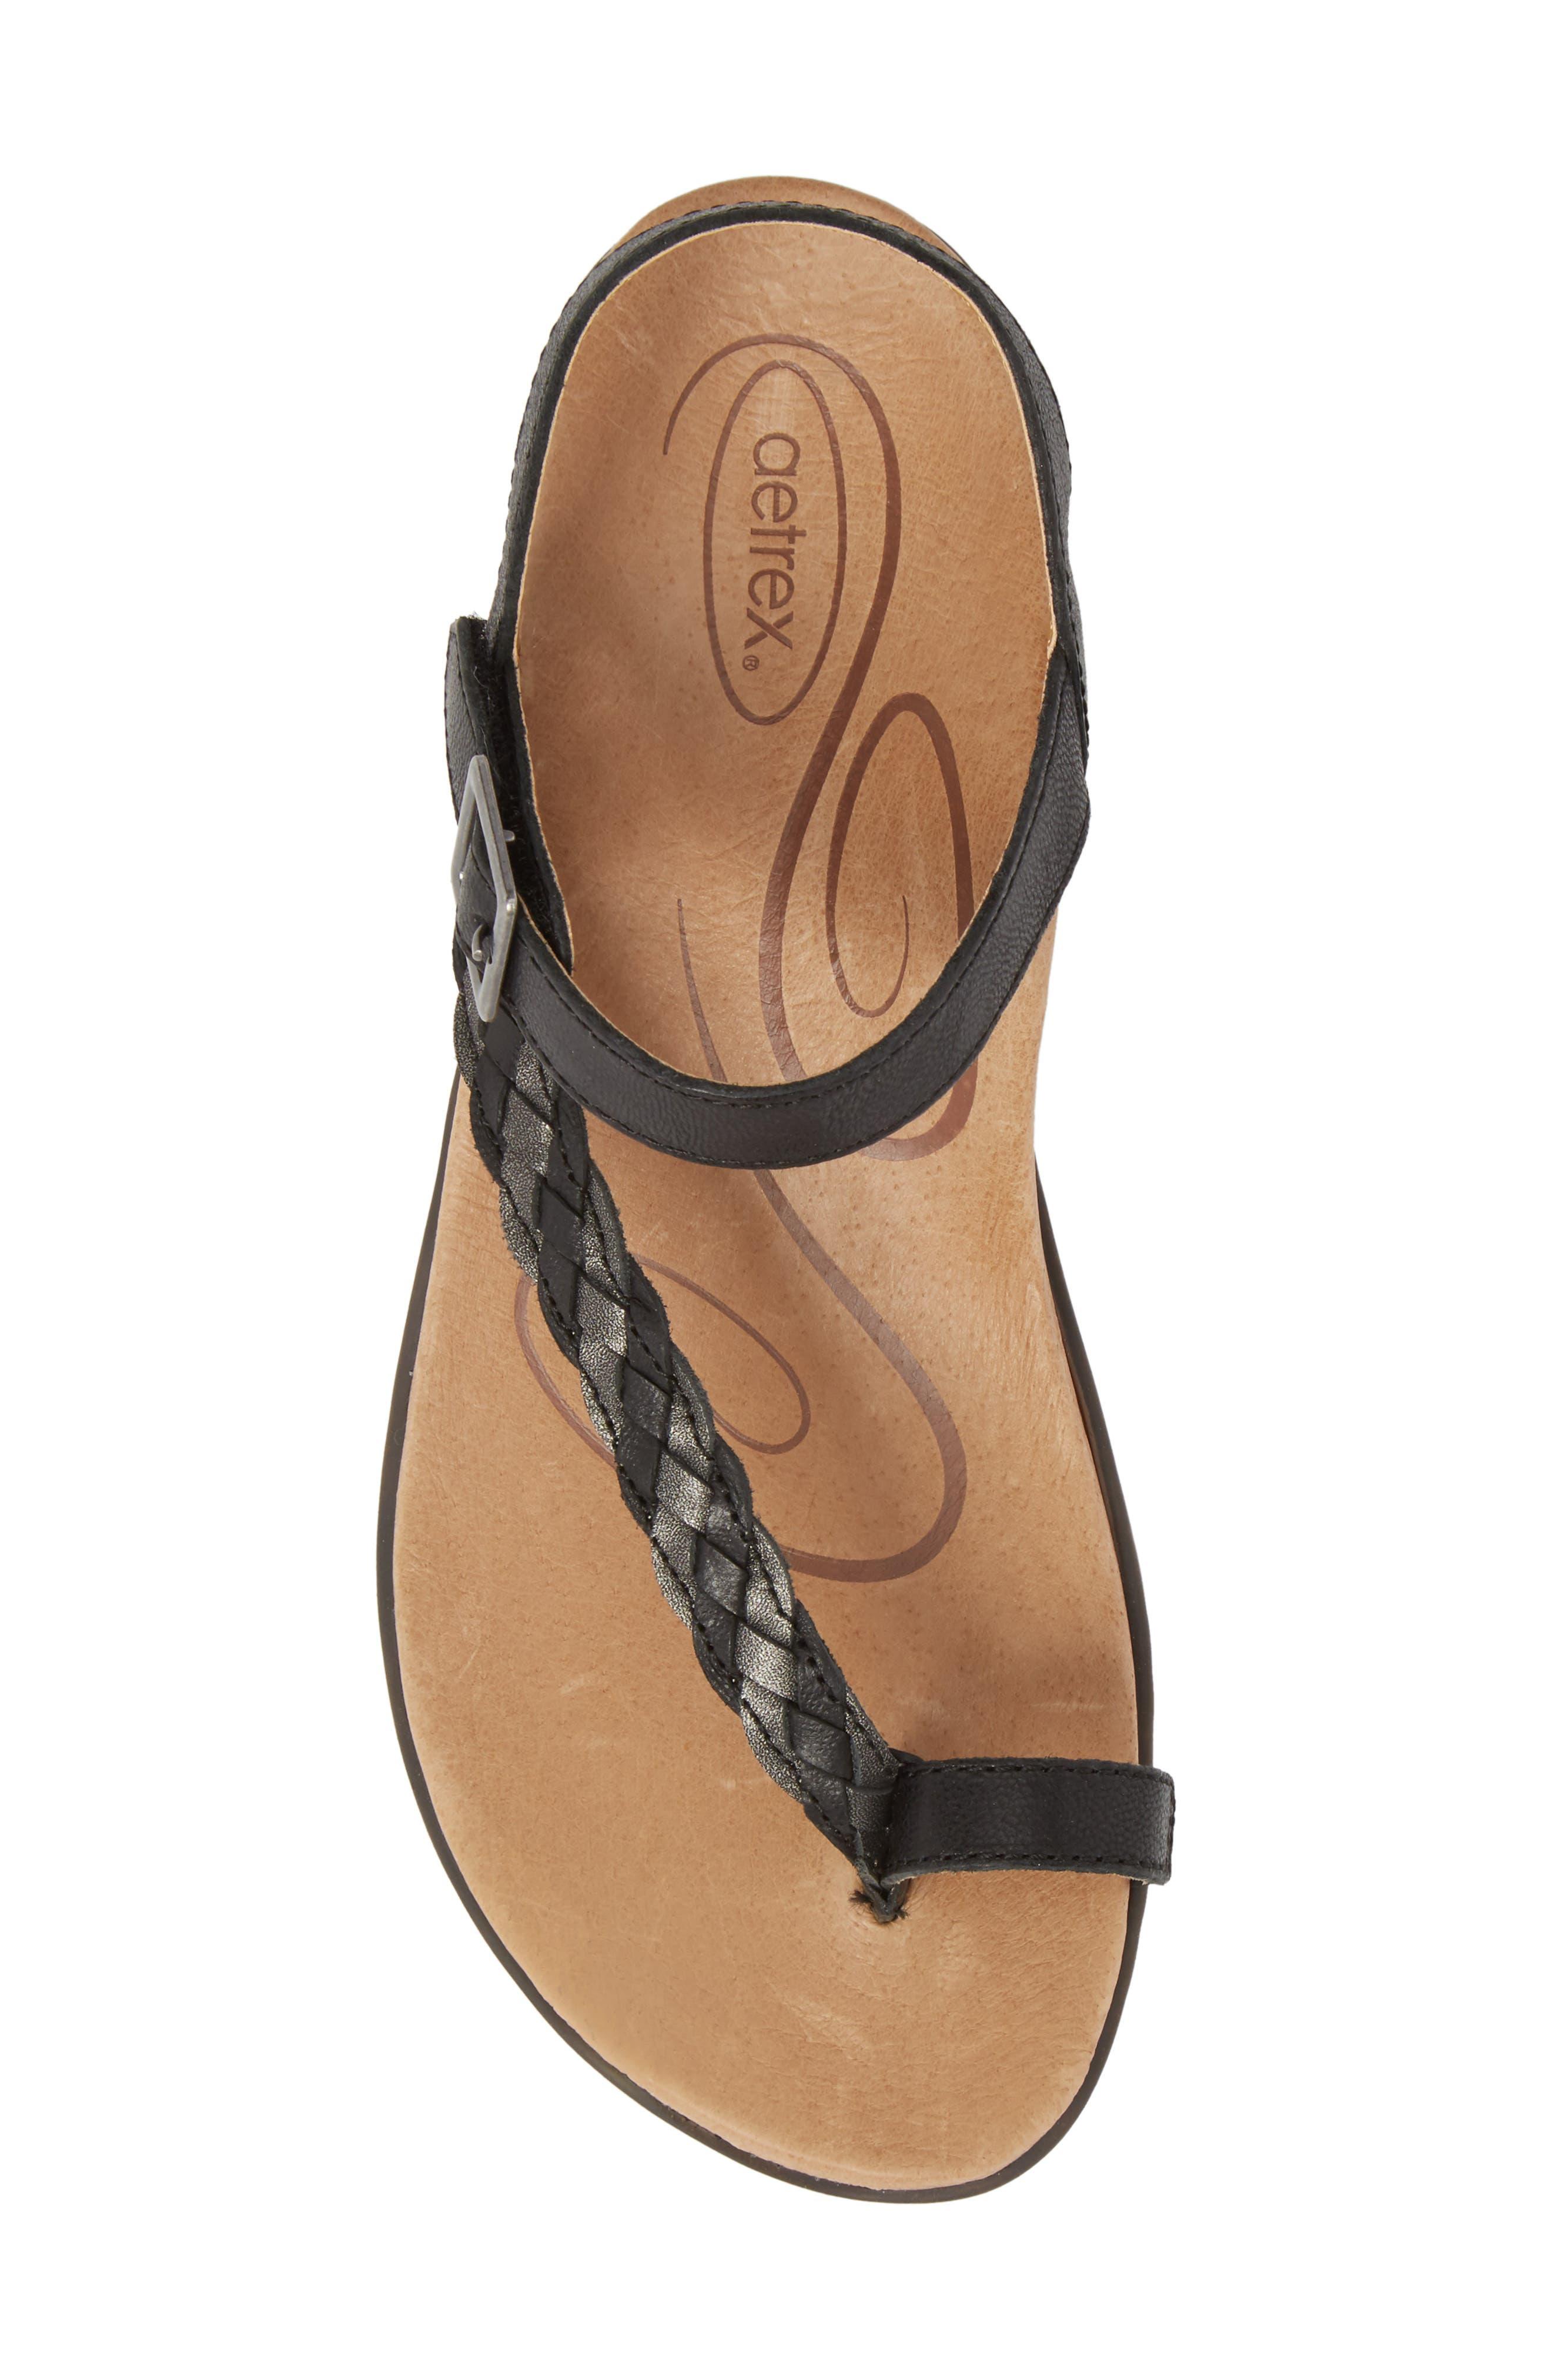 AETREX, Evie Braided Strap Sandal, Alternate thumbnail 5, color, BLACK LEATHER